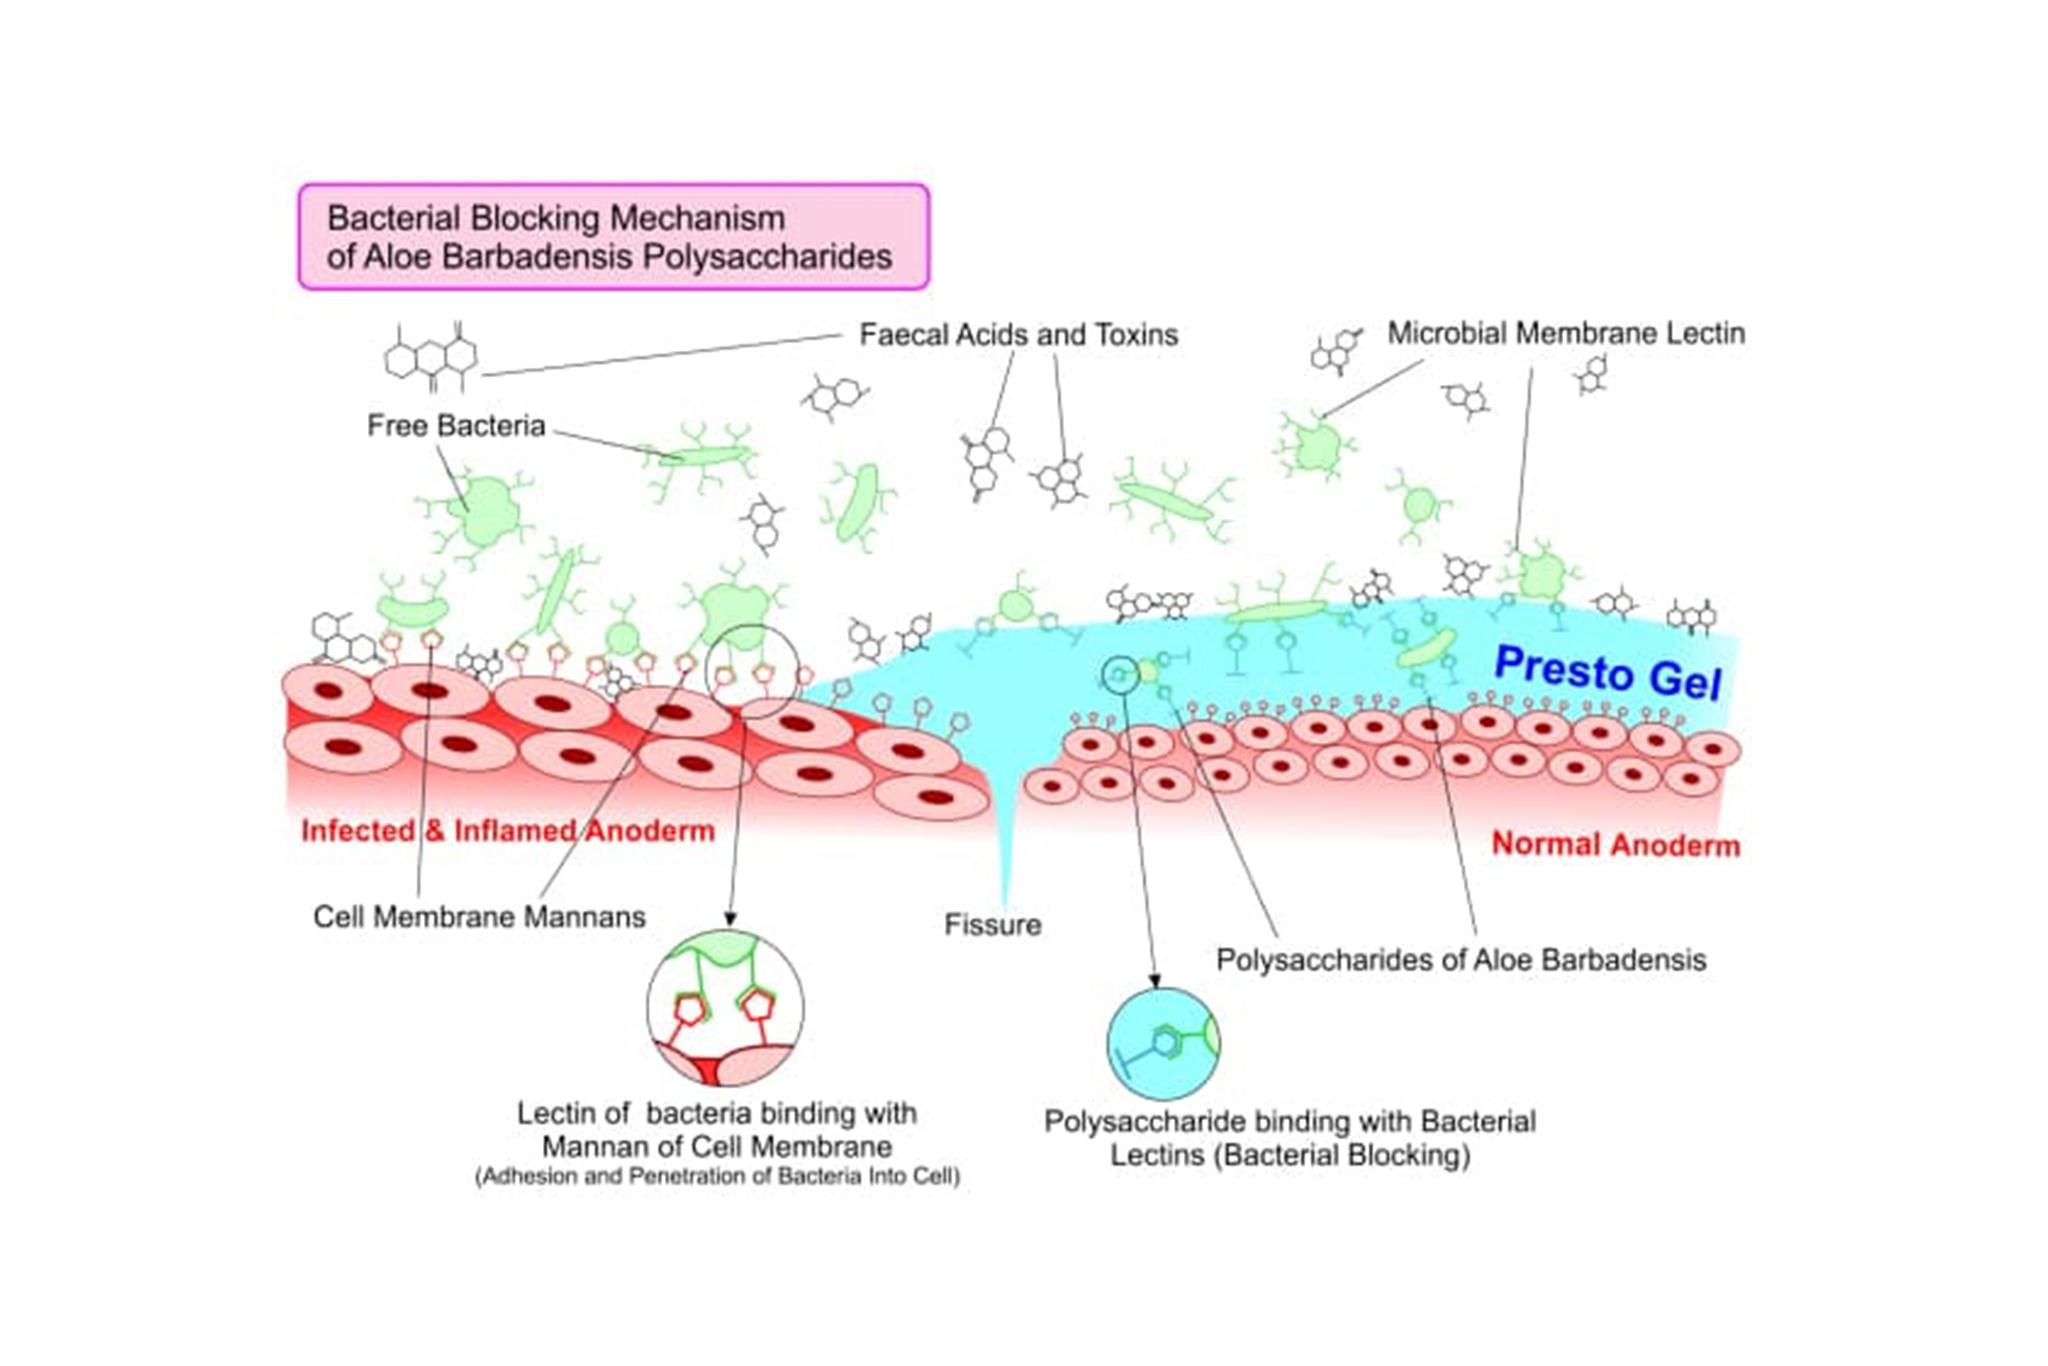 Bacterial Blocking Mechanism of Aloe barbadensis polysaccharides